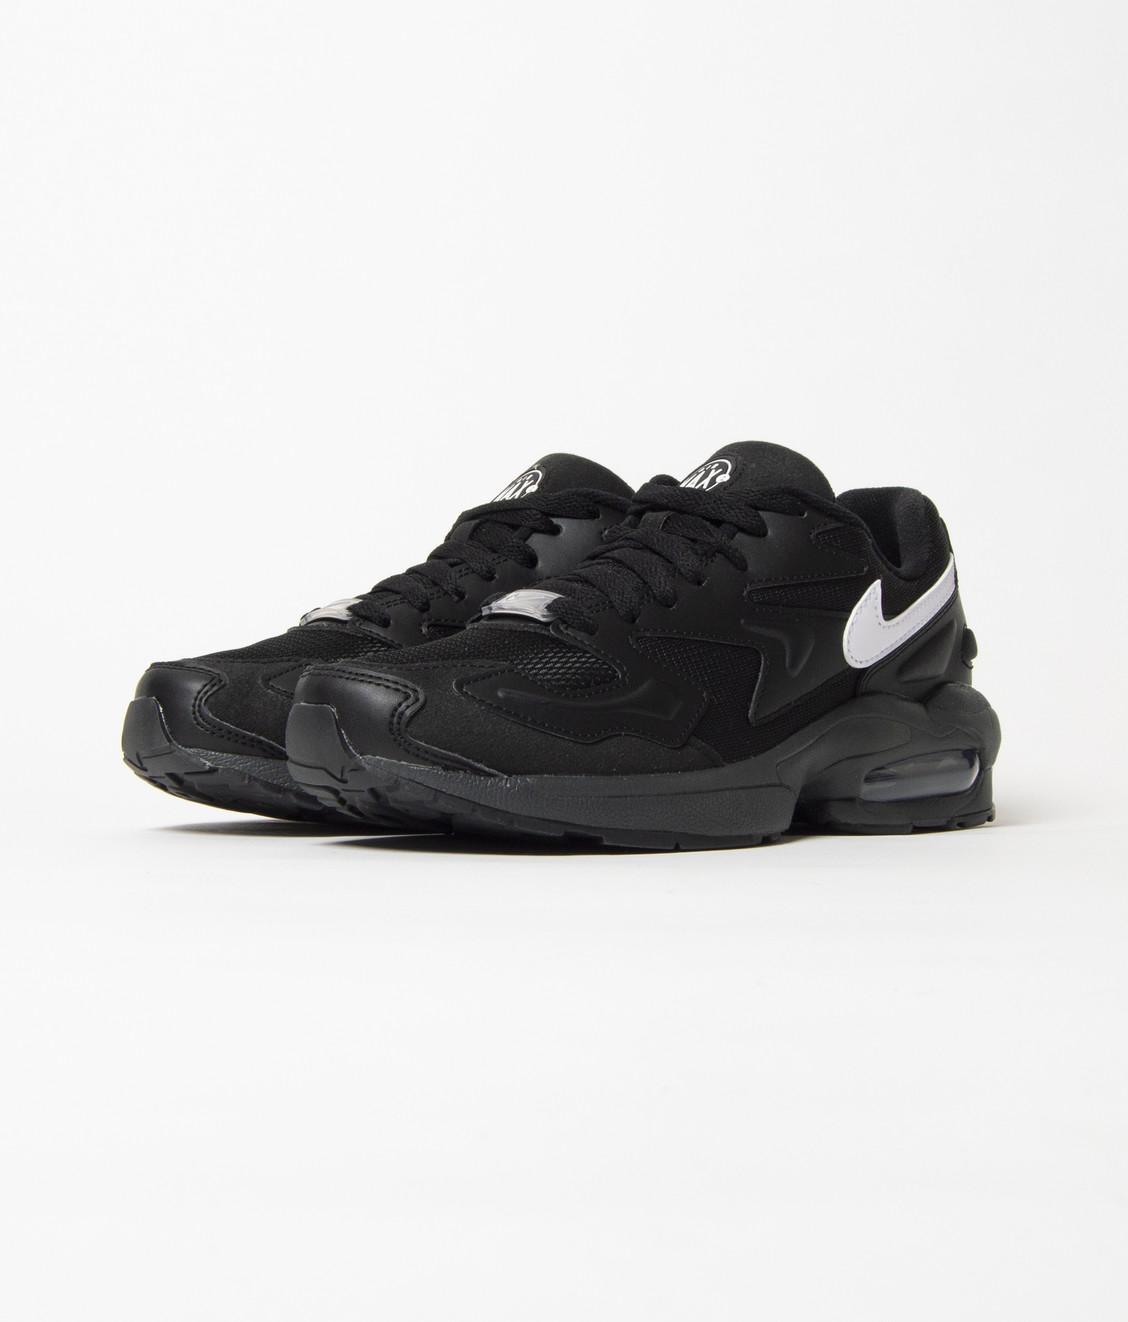 Nike Nike Air Max2 Light Black White